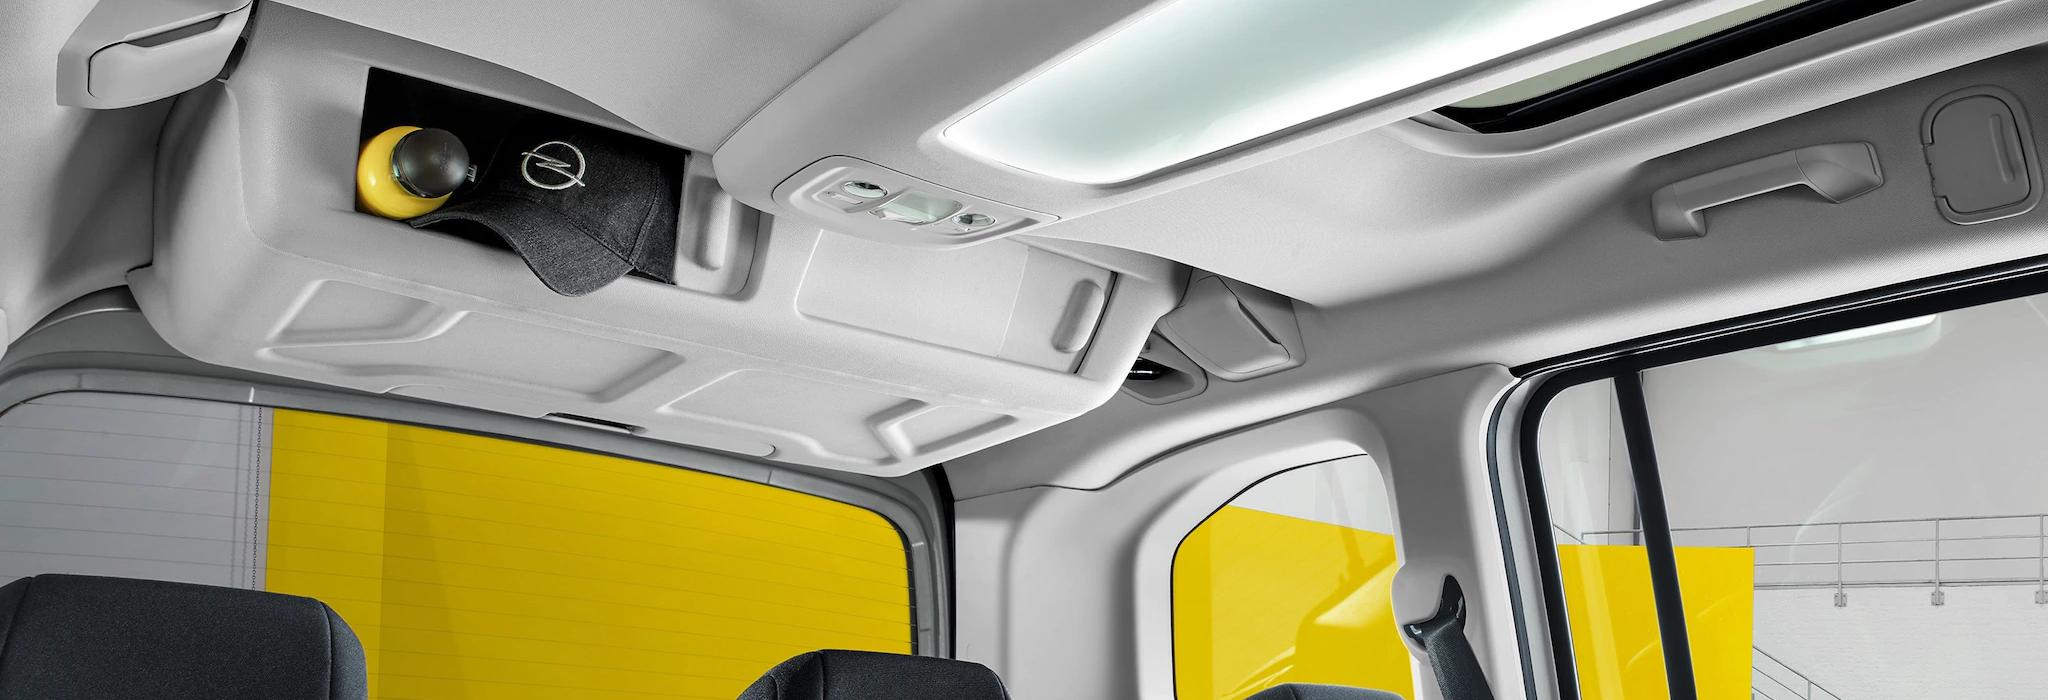 Opel_combo_life_storage_options_21x9_cml18_i01_046